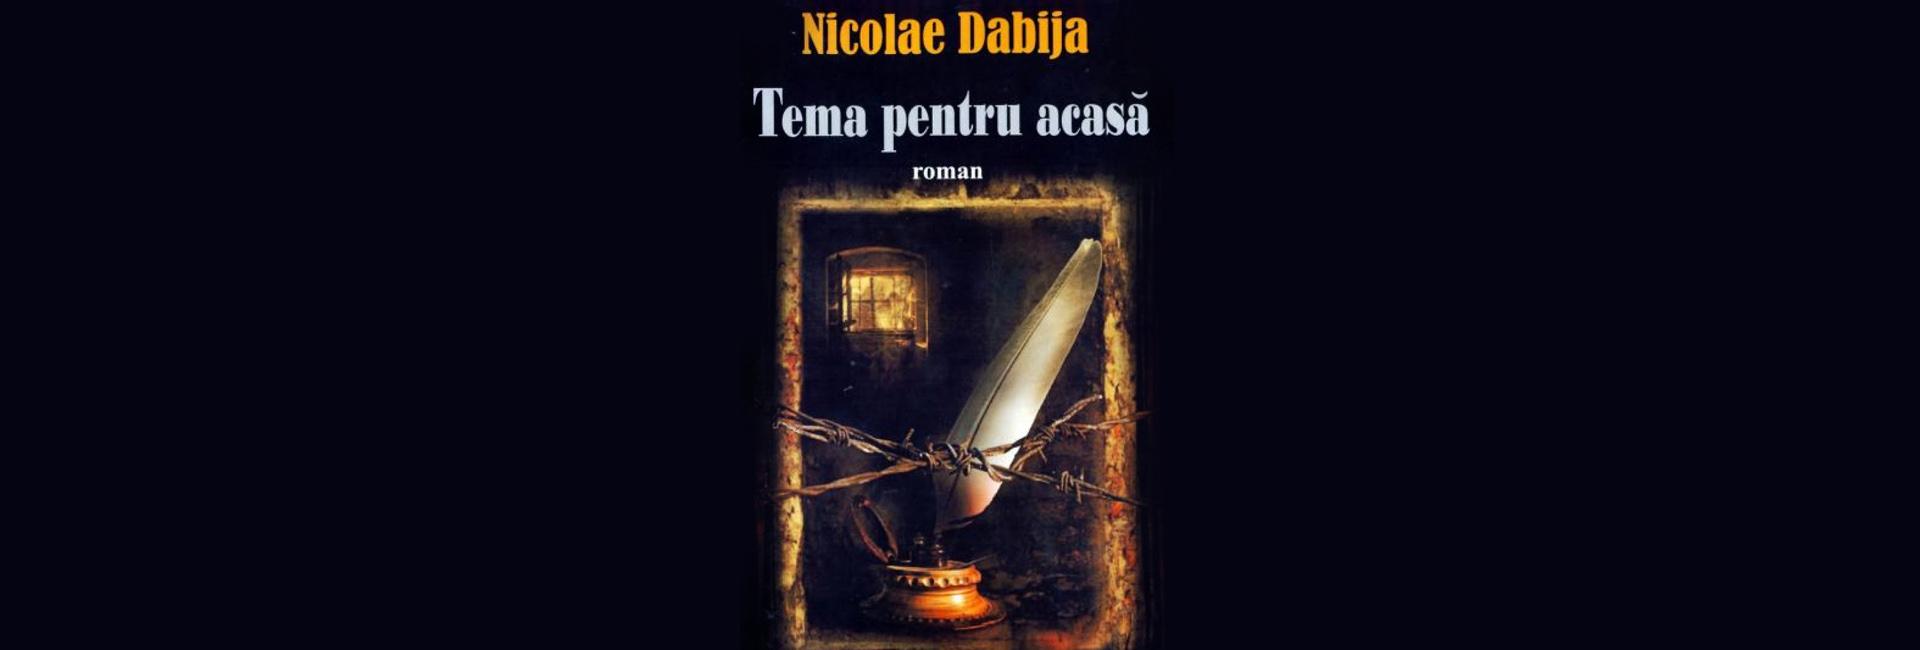 carte roman Nicolae Dabija Tema pentru acasă Basarabia